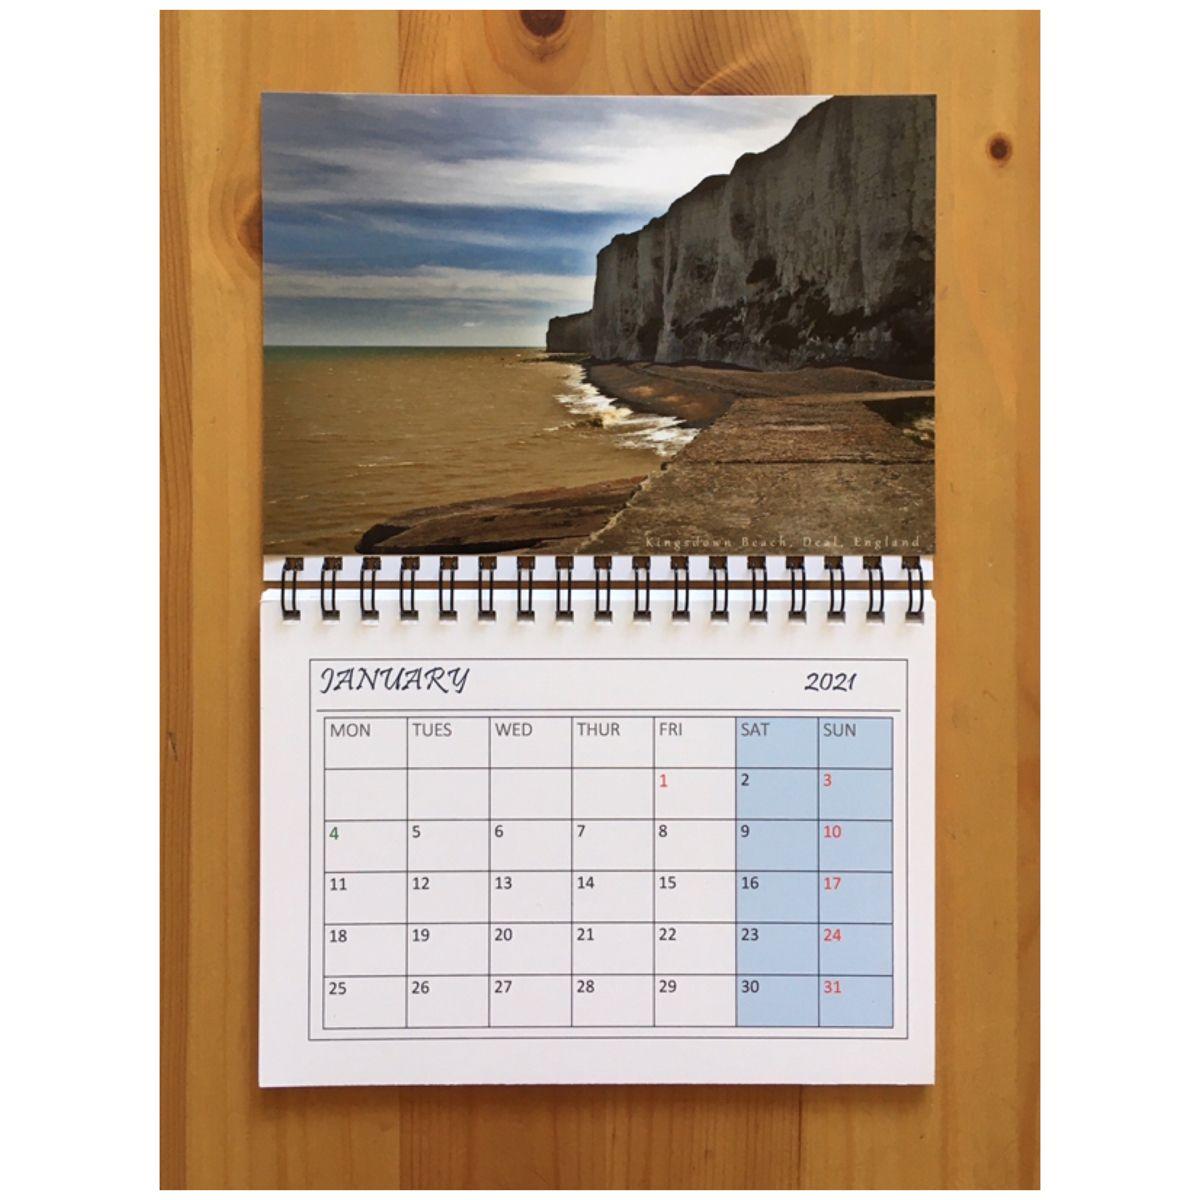 Fridge Calendar 2021 Seascape Magnetic Calendar 2021 A6 Etsy Printed Magnets Magnetic Calendar Vertical Calendar